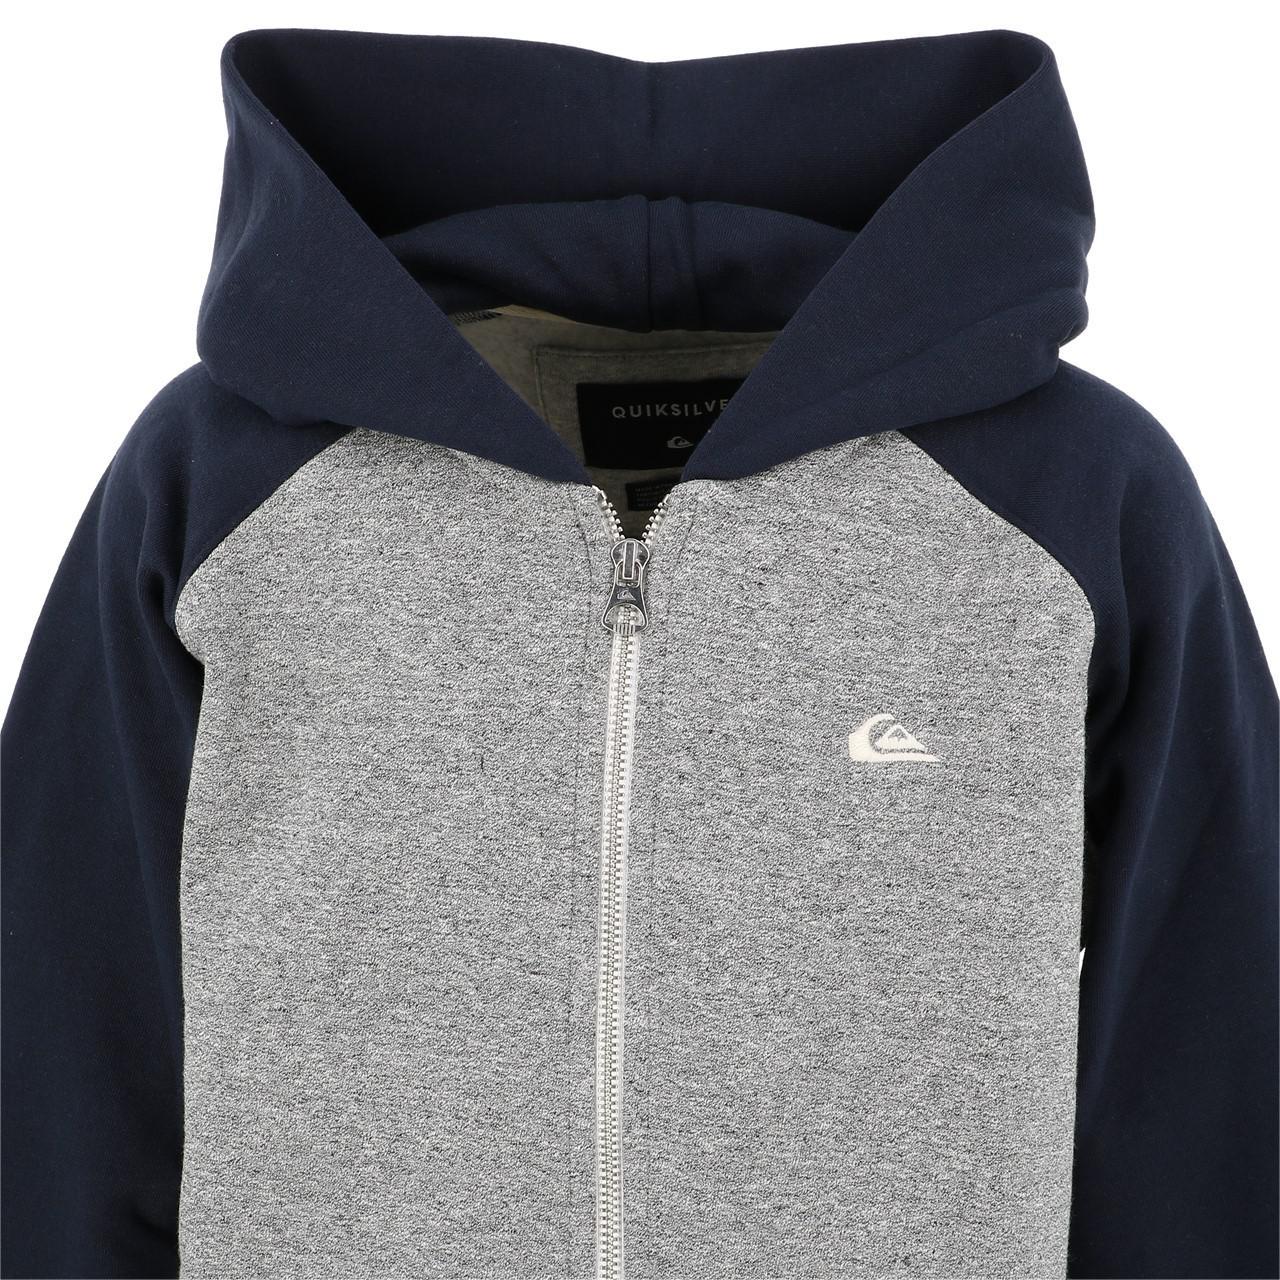 Jacken-Sweatshirts-Zipped-Kapuze-Quiksilver-Everyday-Grc-Fz-Umhang-Sw-Jr-Grau Indexbild 2